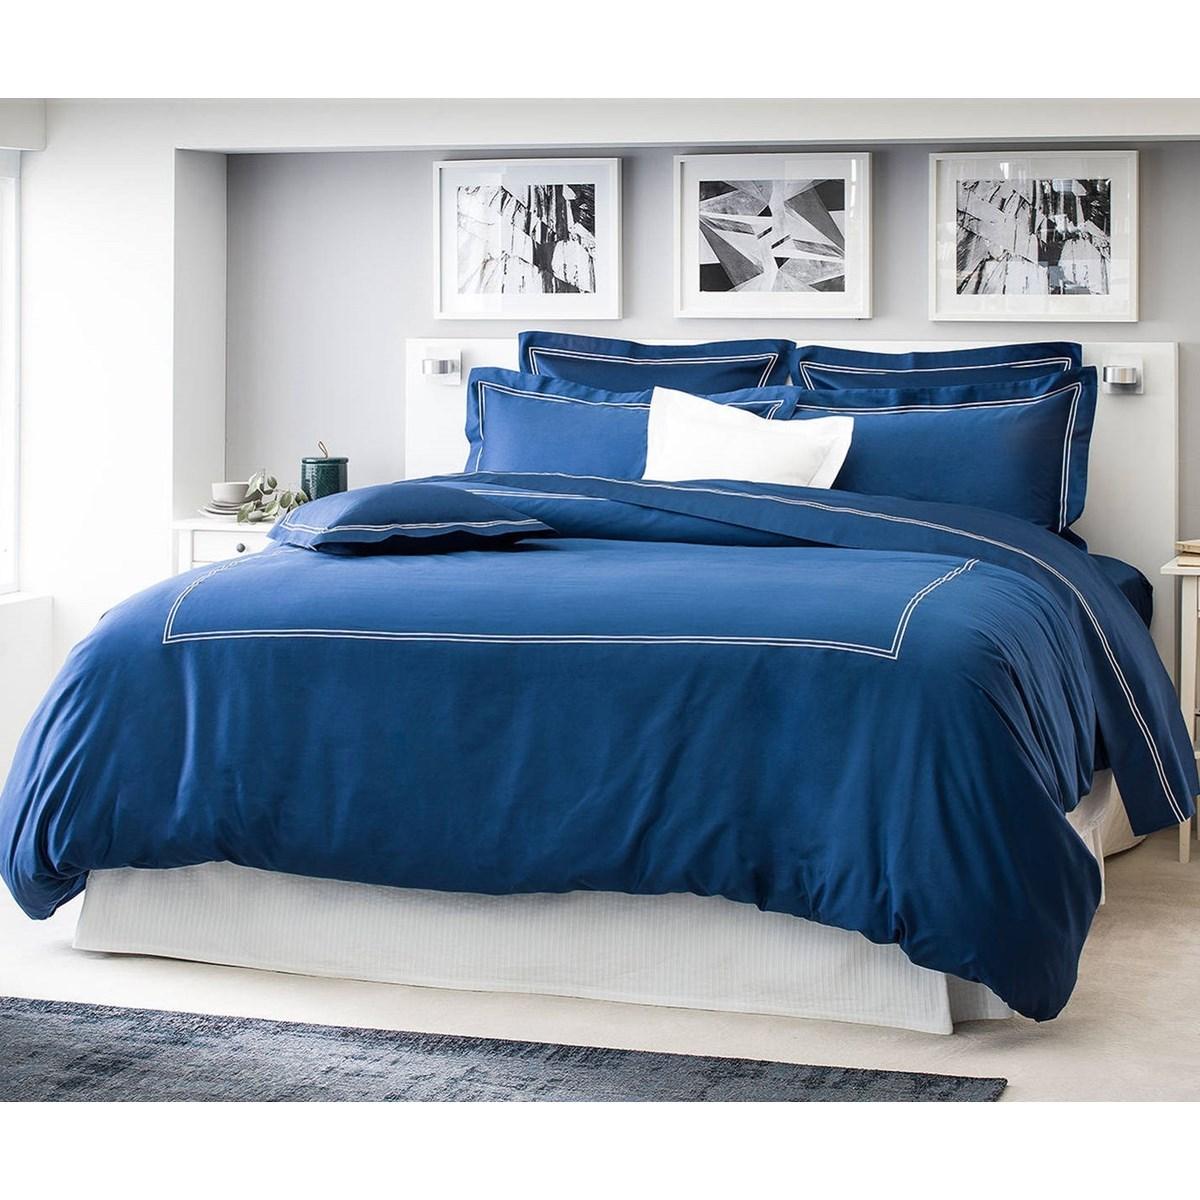 Drap plat luxe en Satin de coton Bleu 240x310 cm